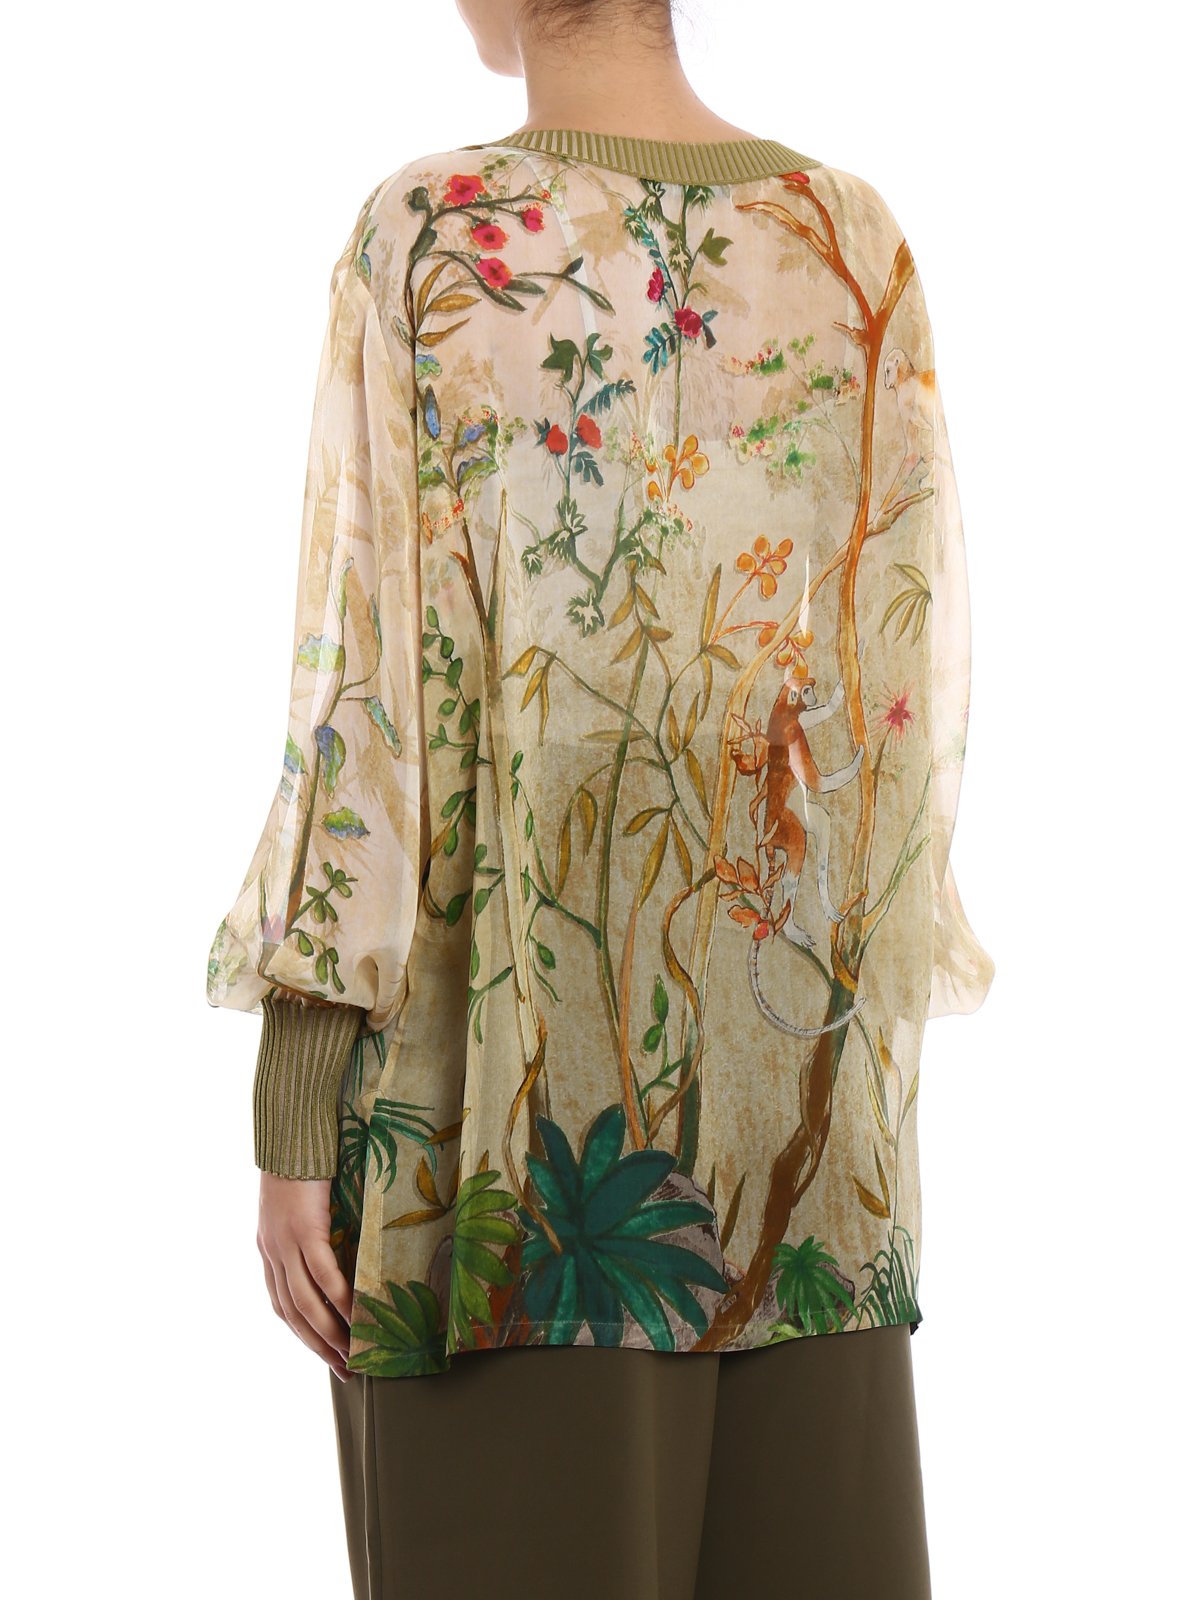 Printed blouse Alberta Ferretti Sale Online Cheap 8LdoITEVj